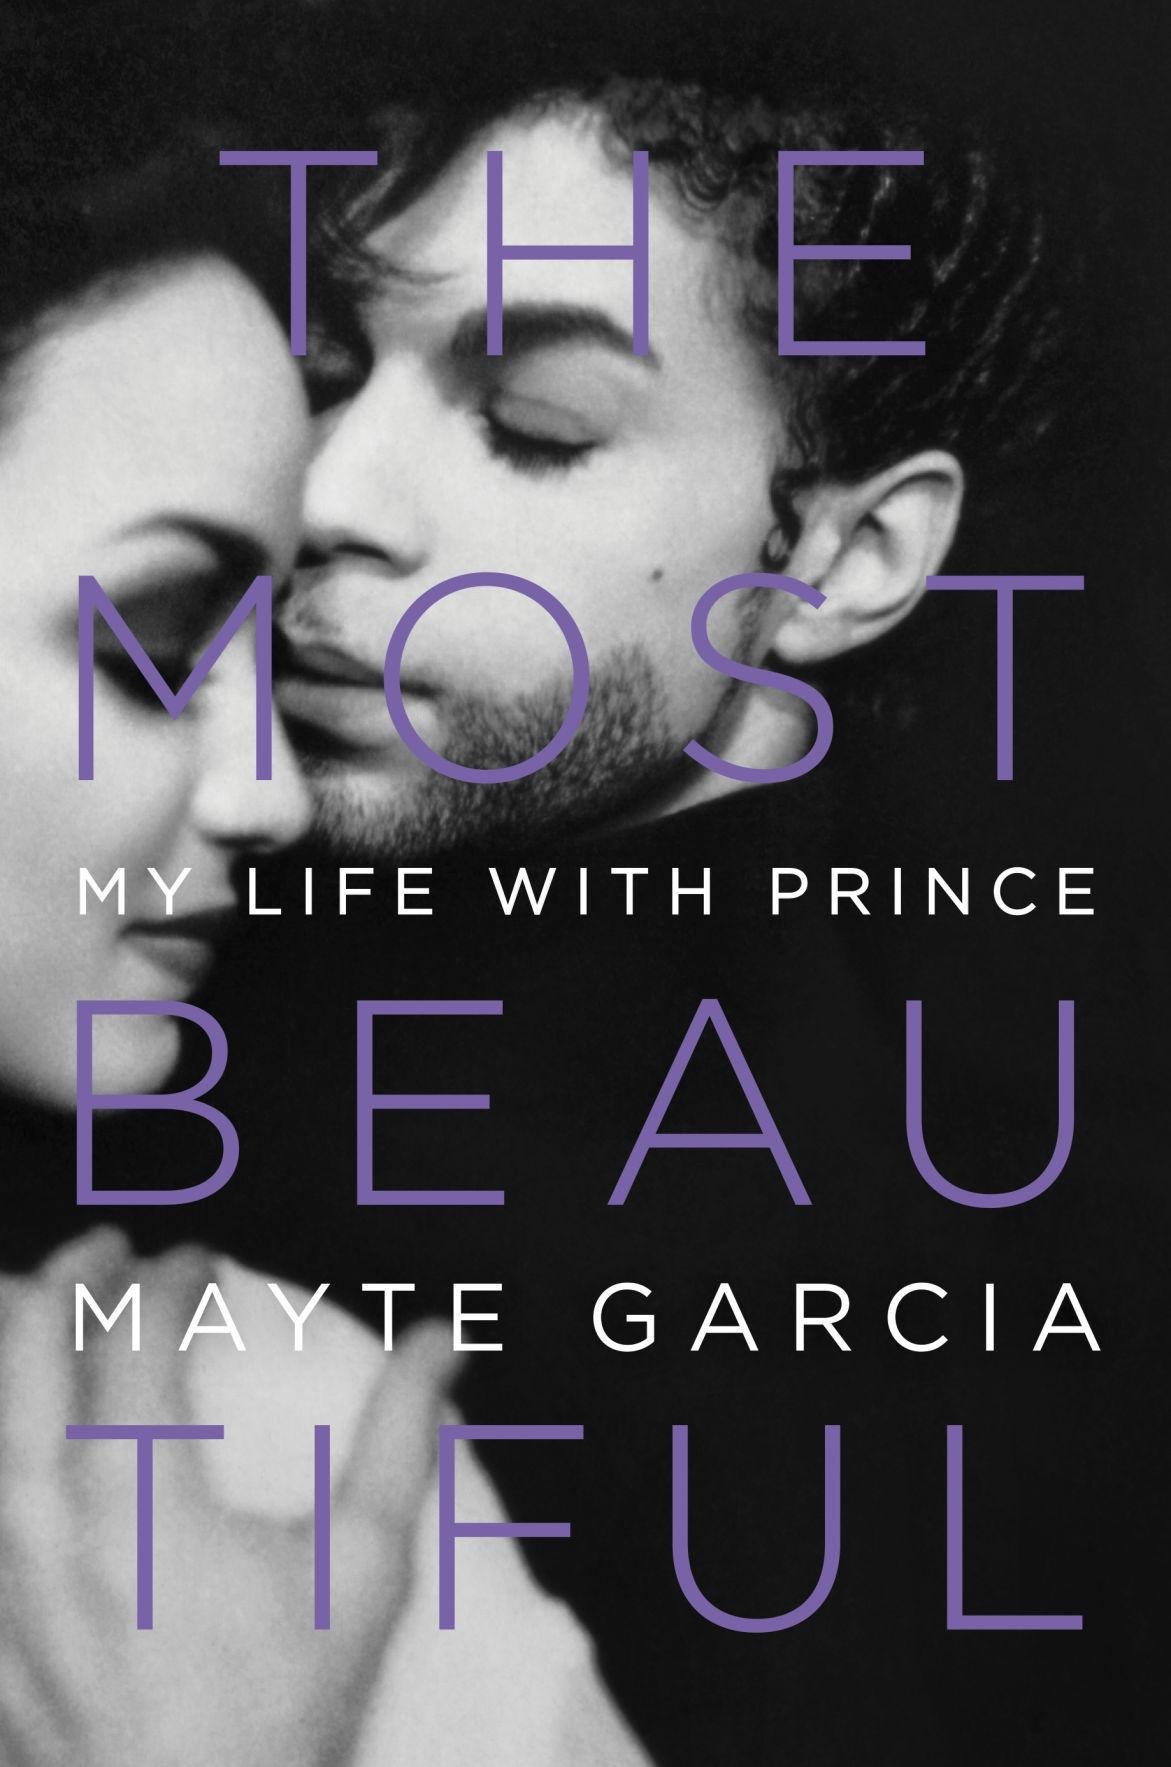 Books Prince Garcia